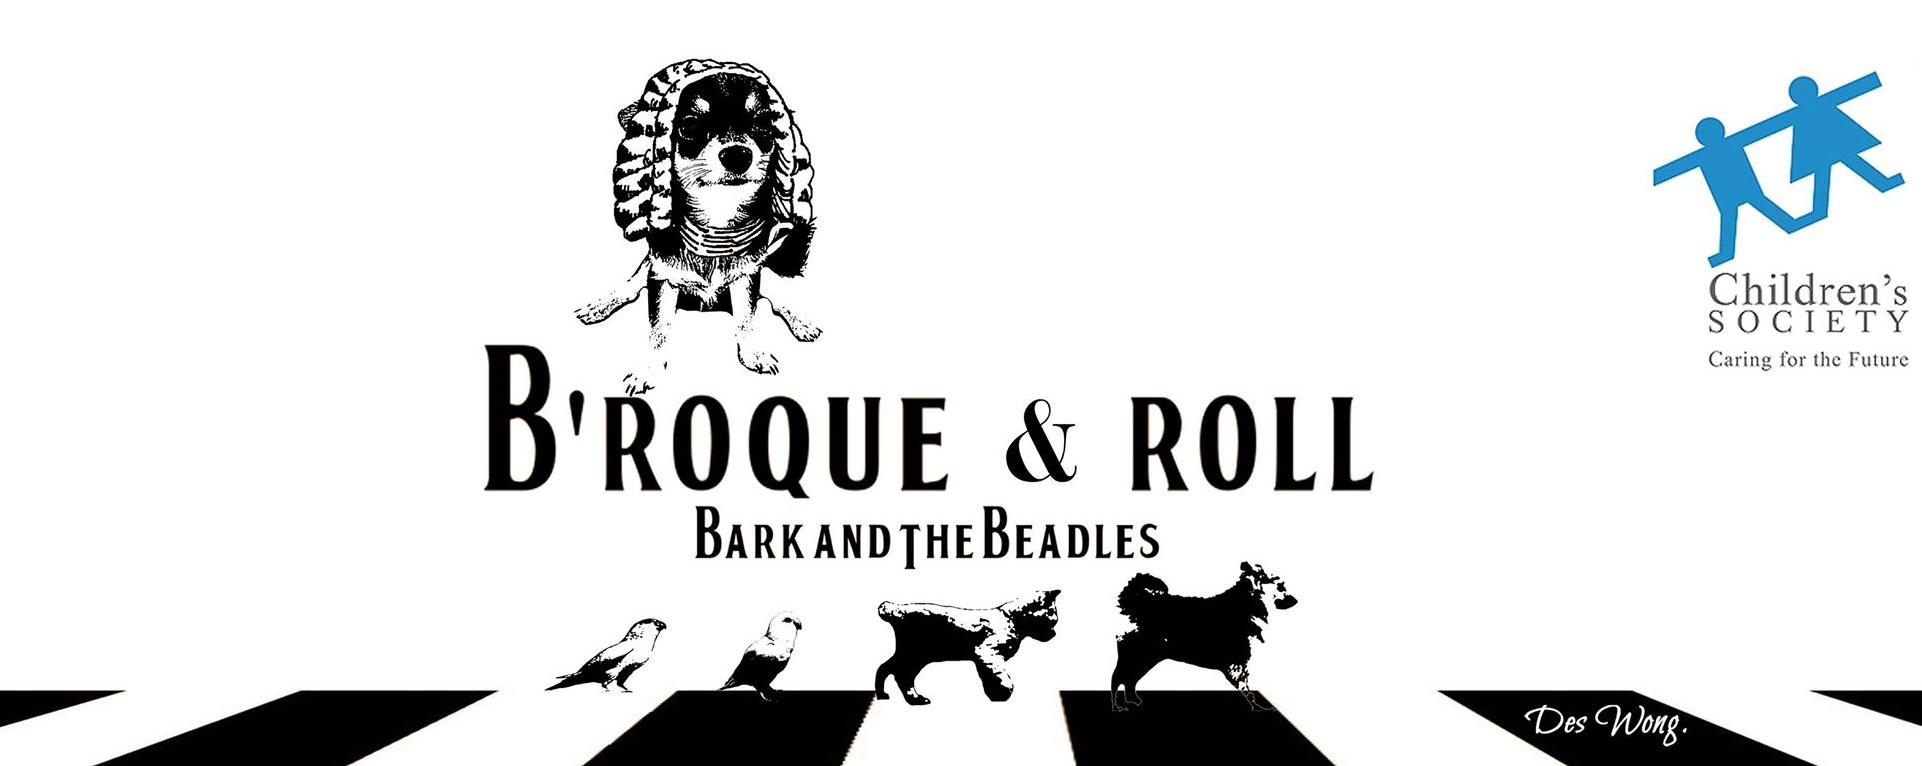 B'Roque & Roll